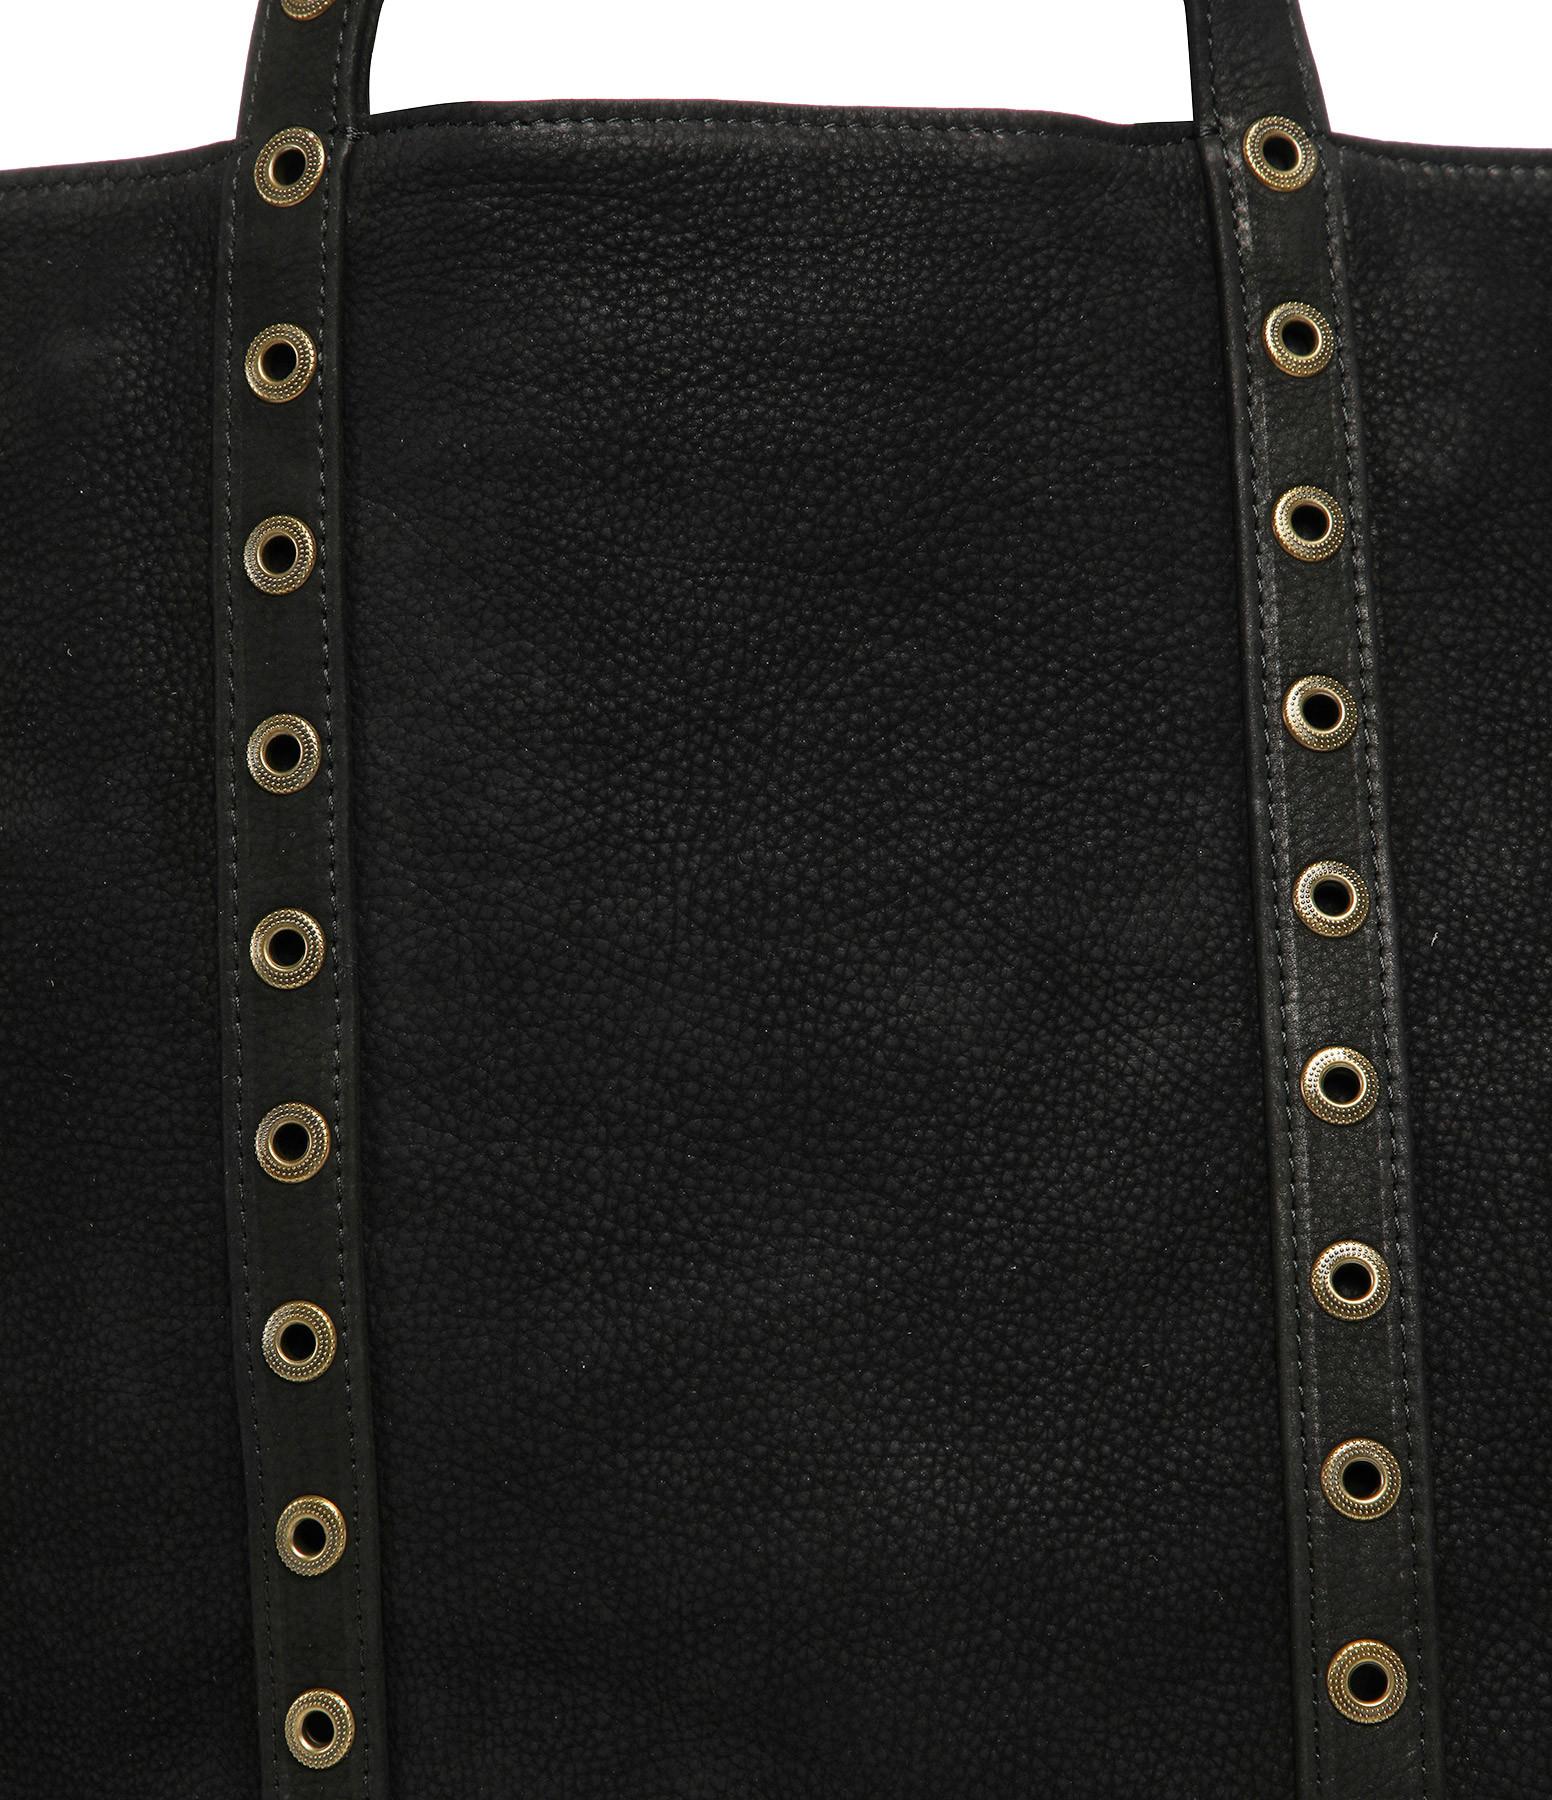 VANESSA BRUNO - Cabas Medium Nubuck Œillets Noir